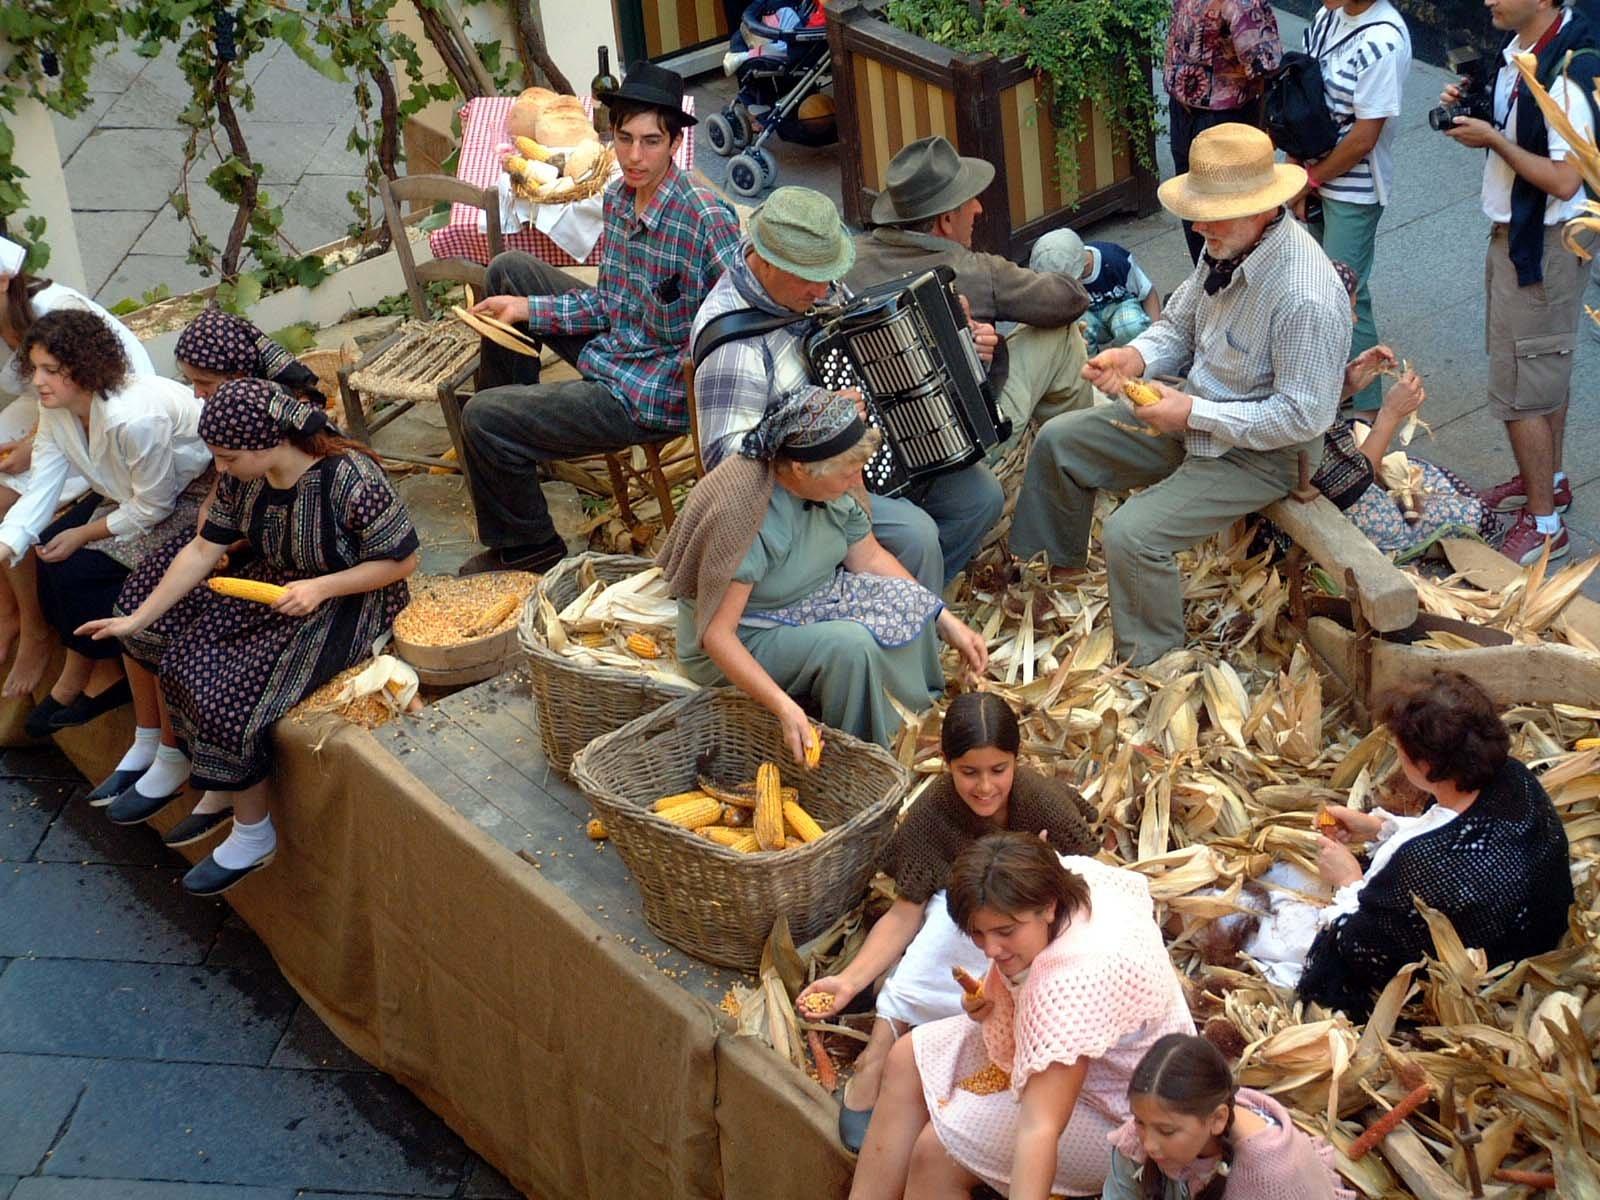 Douja d'or-Festival delle Sagre astigiane